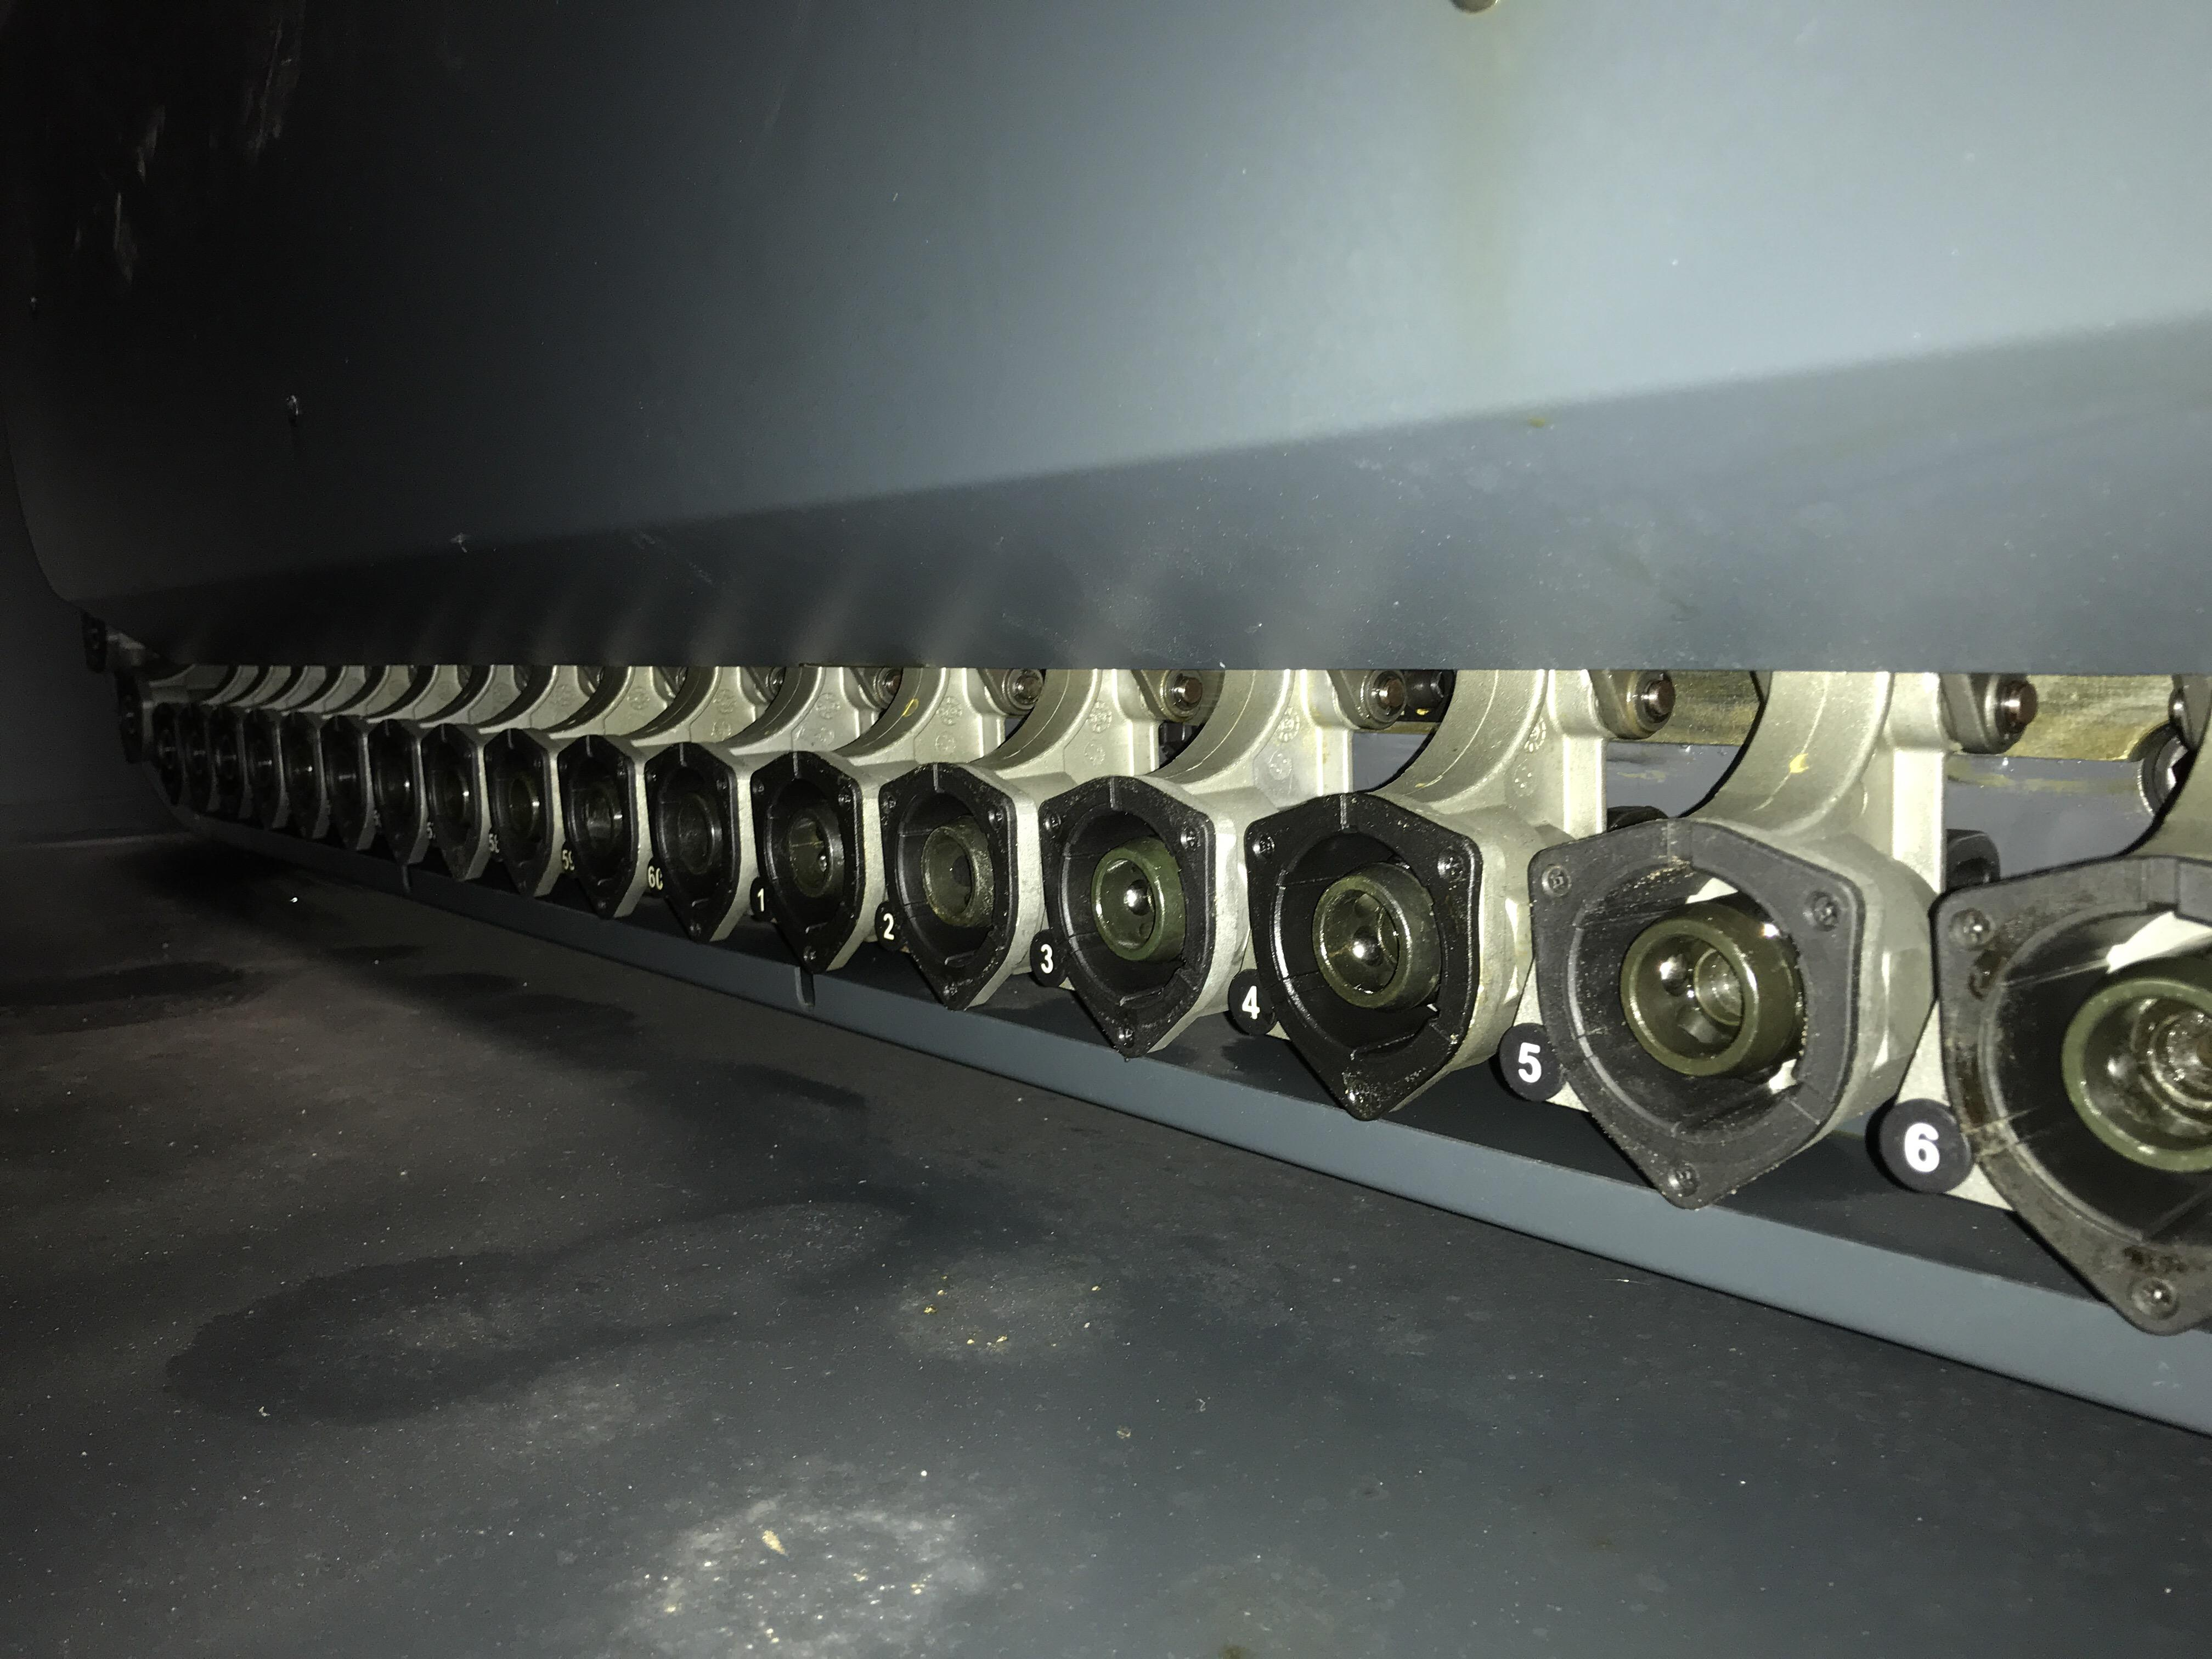 2015 DMG MORI DMU 65 monoBLOCK - Vertical Machining Center